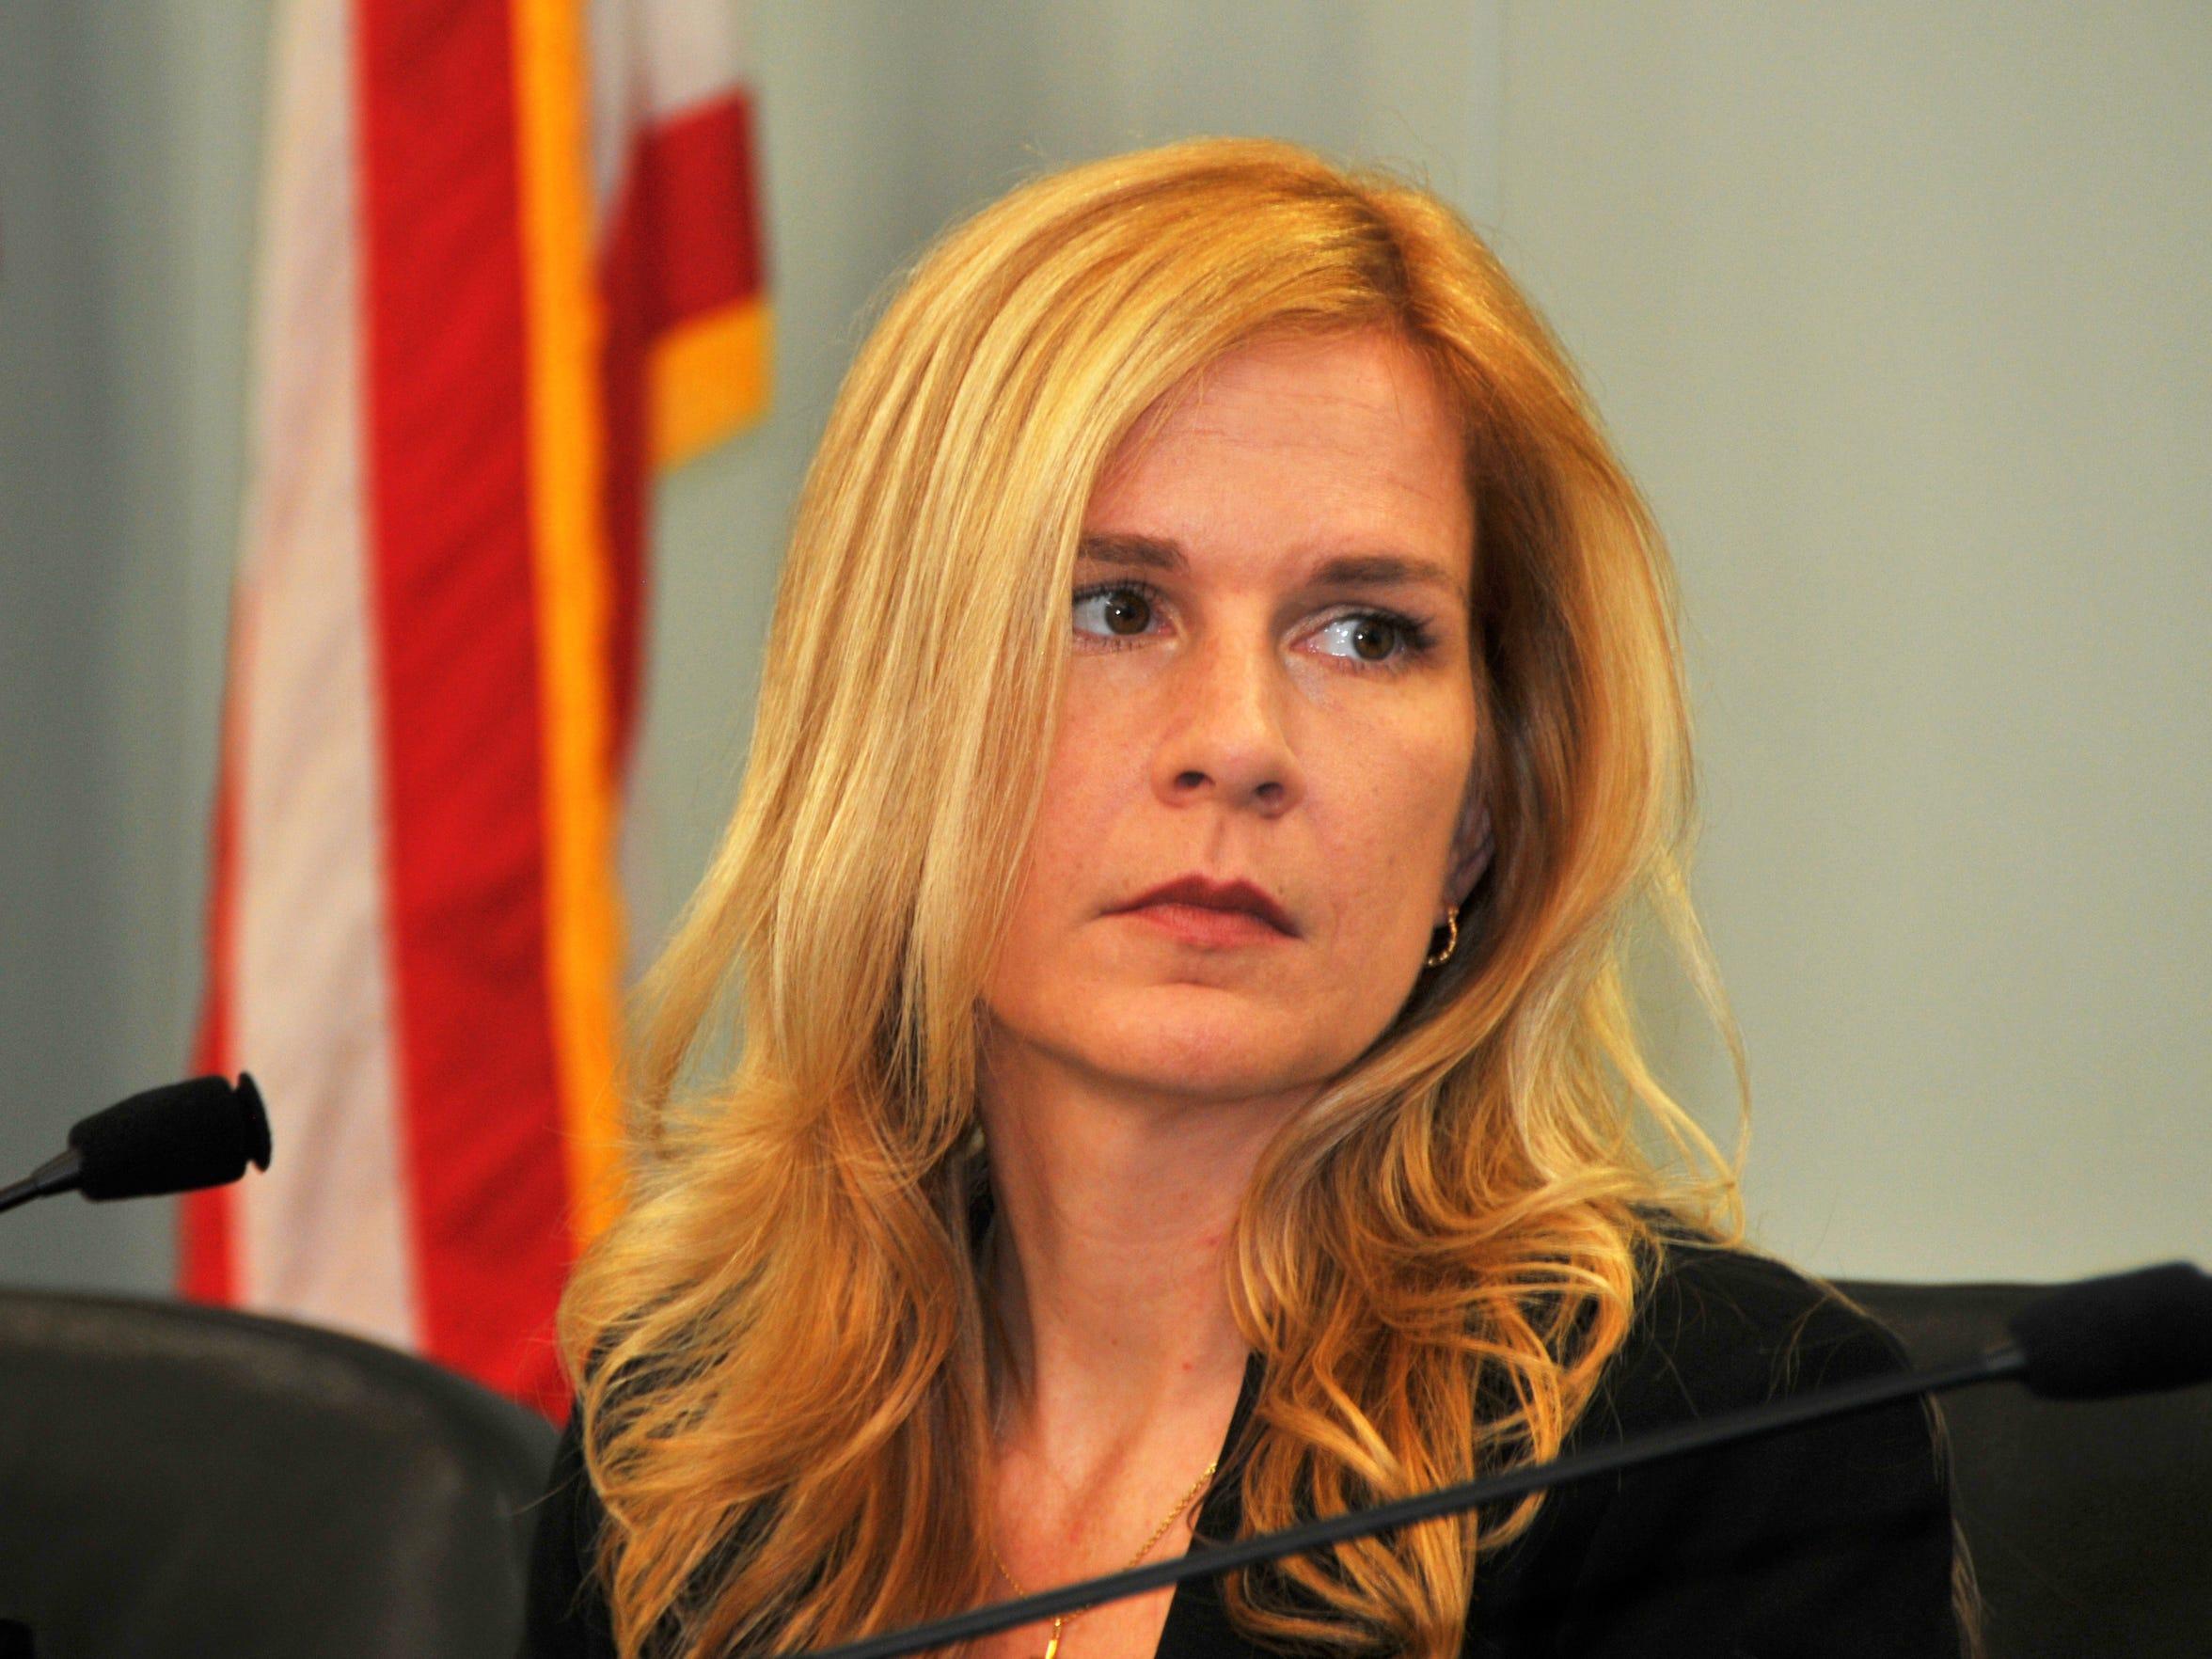 Brevard County Commissioner Kristine Isnardi